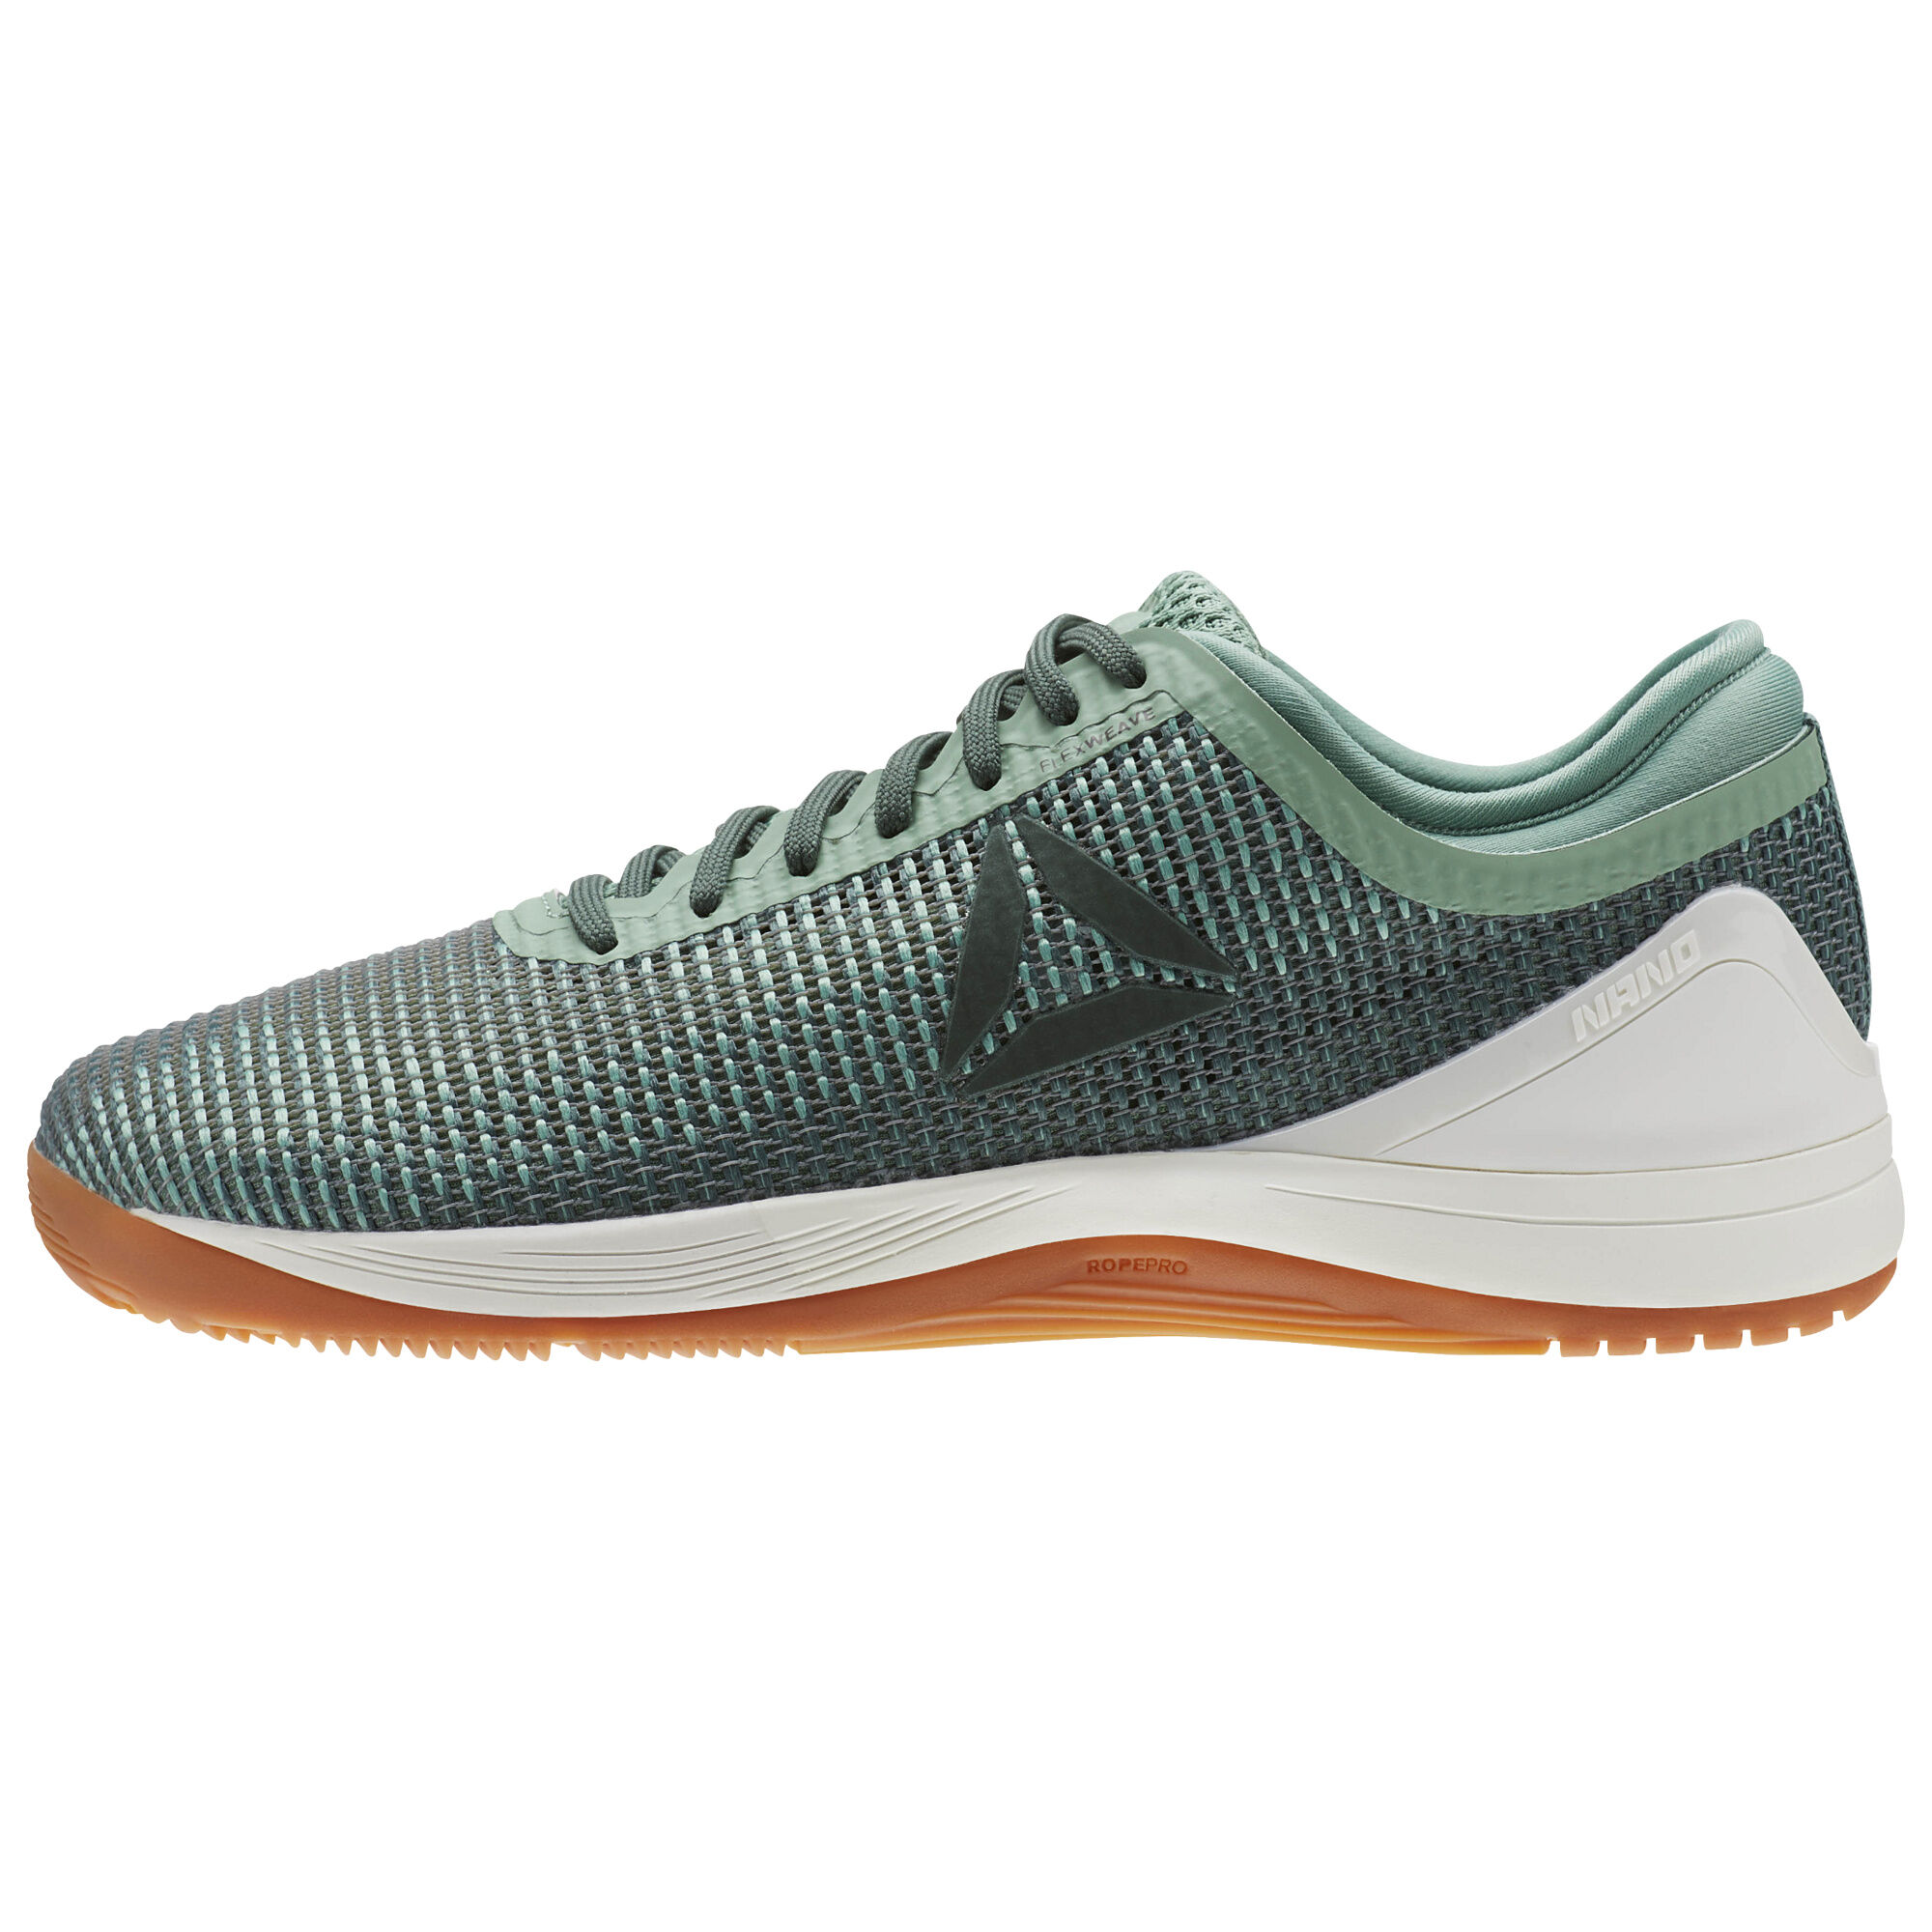 42d8ee114981d0 Reebok CrossFit Nano 8 Flexweave® - Green